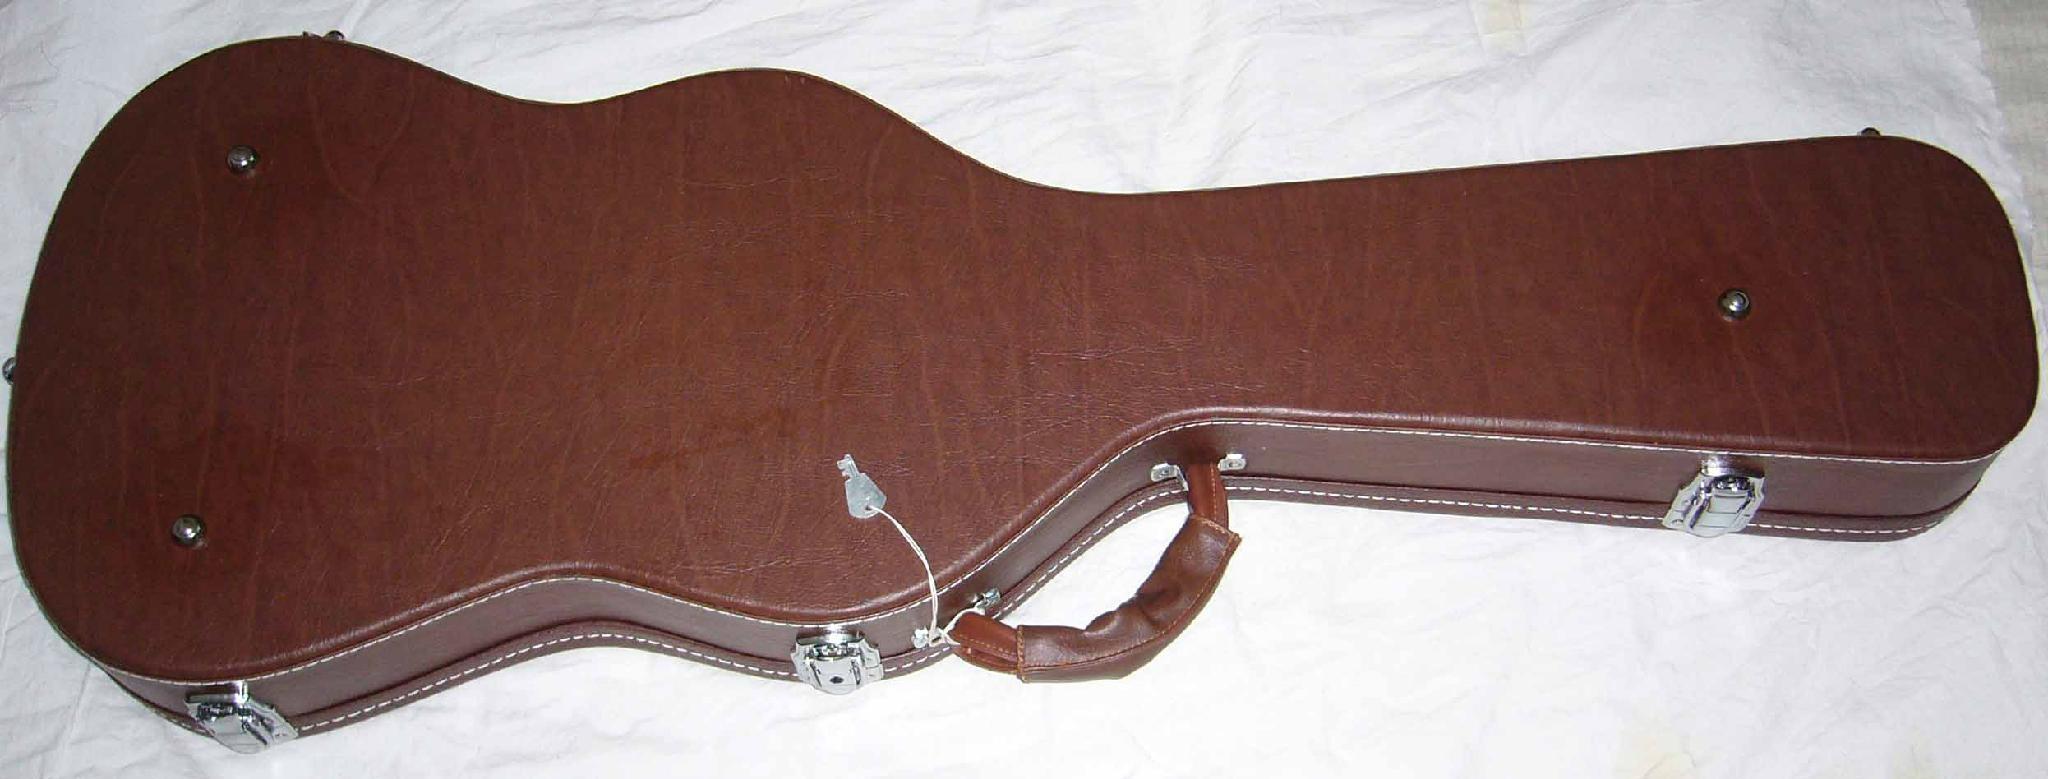 high quality leather guitar case sc 3 custom china manufacturer musical instrument. Black Bedroom Furniture Sets. Home Design Ideas